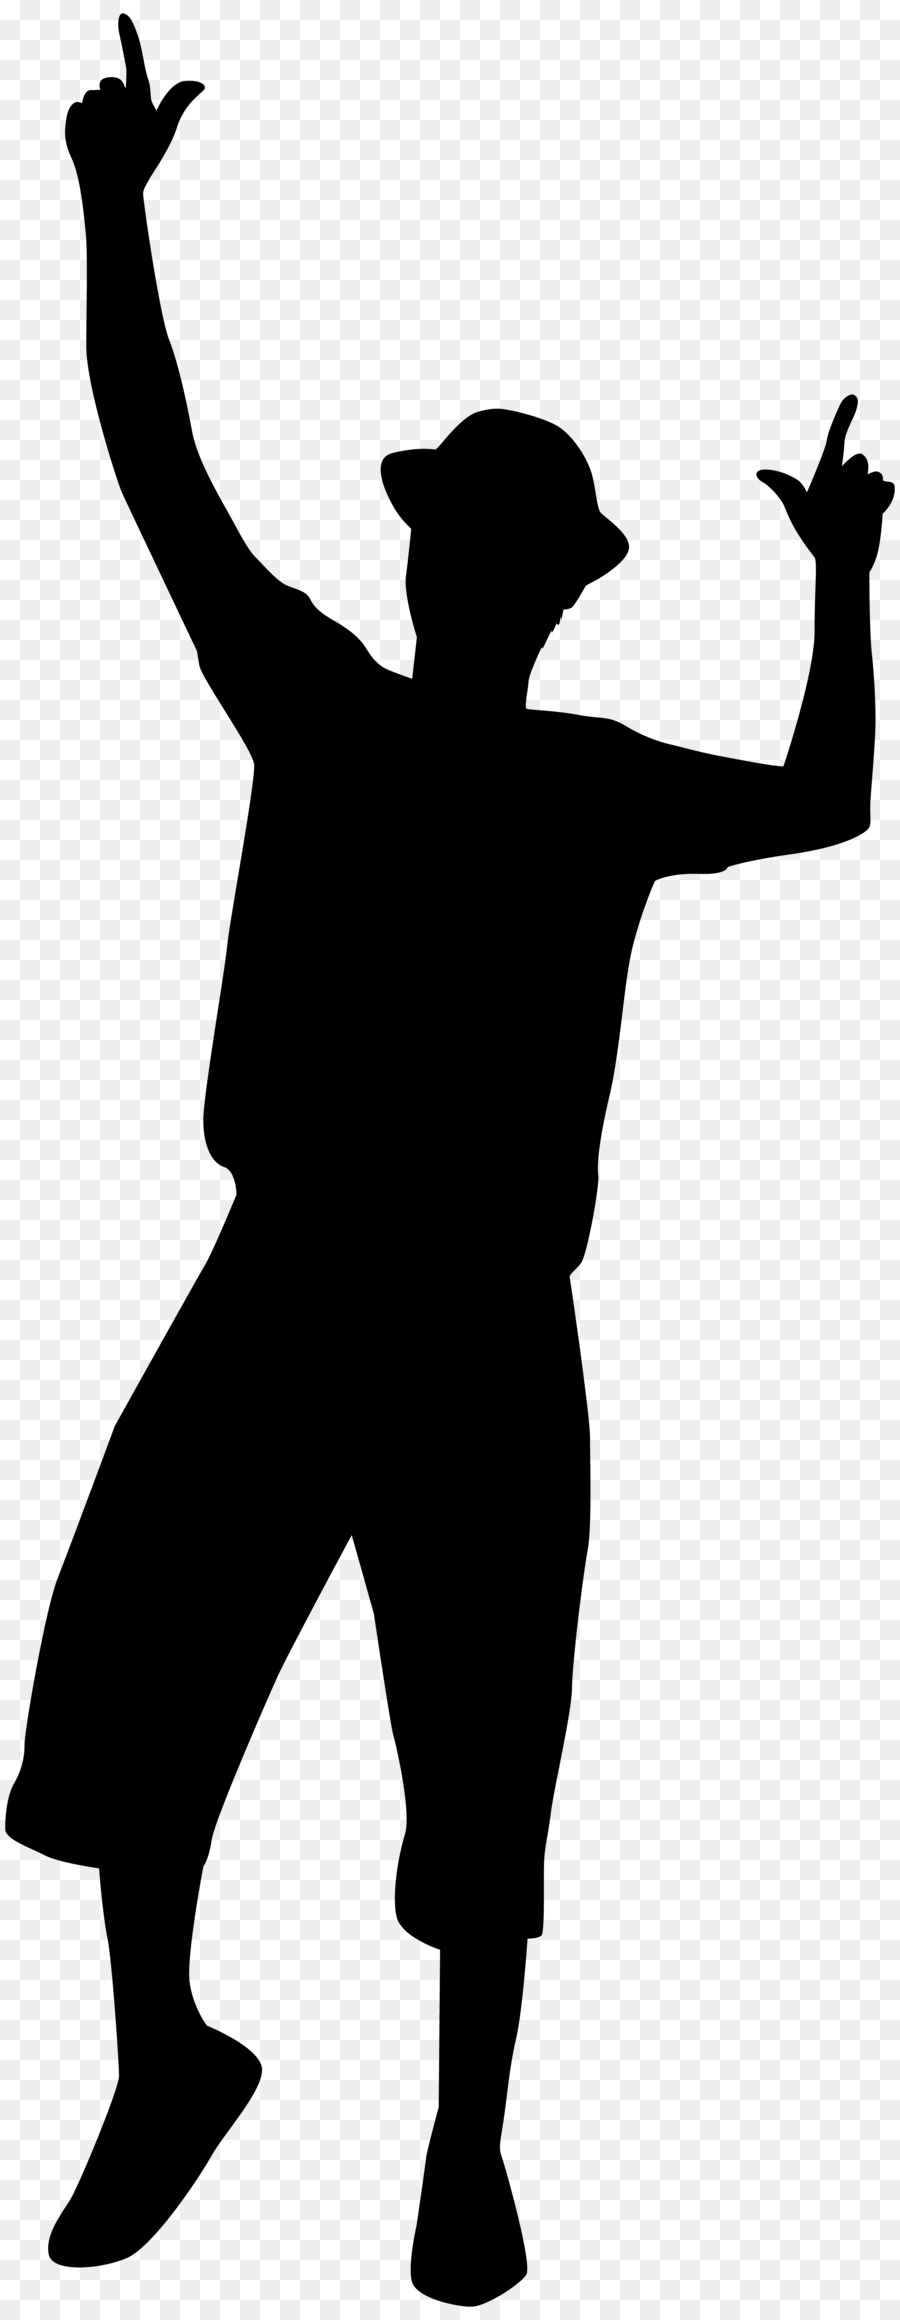 Free Dancing Man Silhouette, Download Free Clip Art, Free Clip Art.